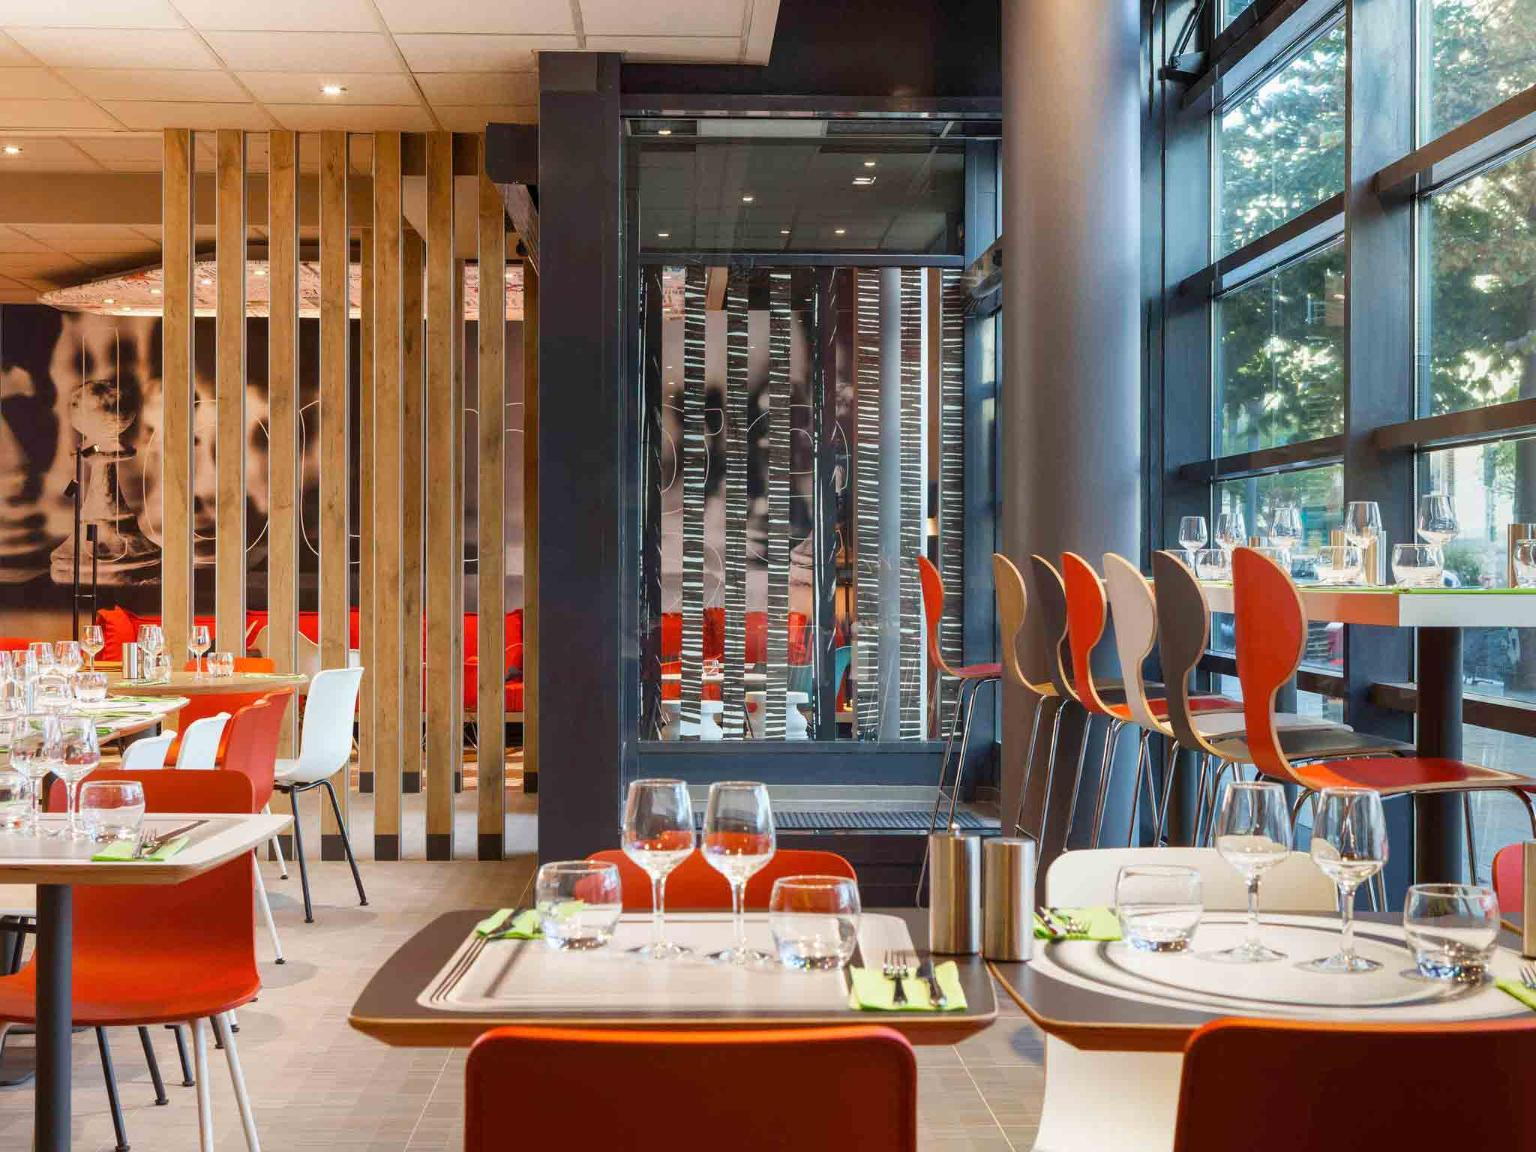 ibis paris porte de clichy centre h tel 15 boulevard. Black Bedroom Furniture Sets. Home Design Ideas